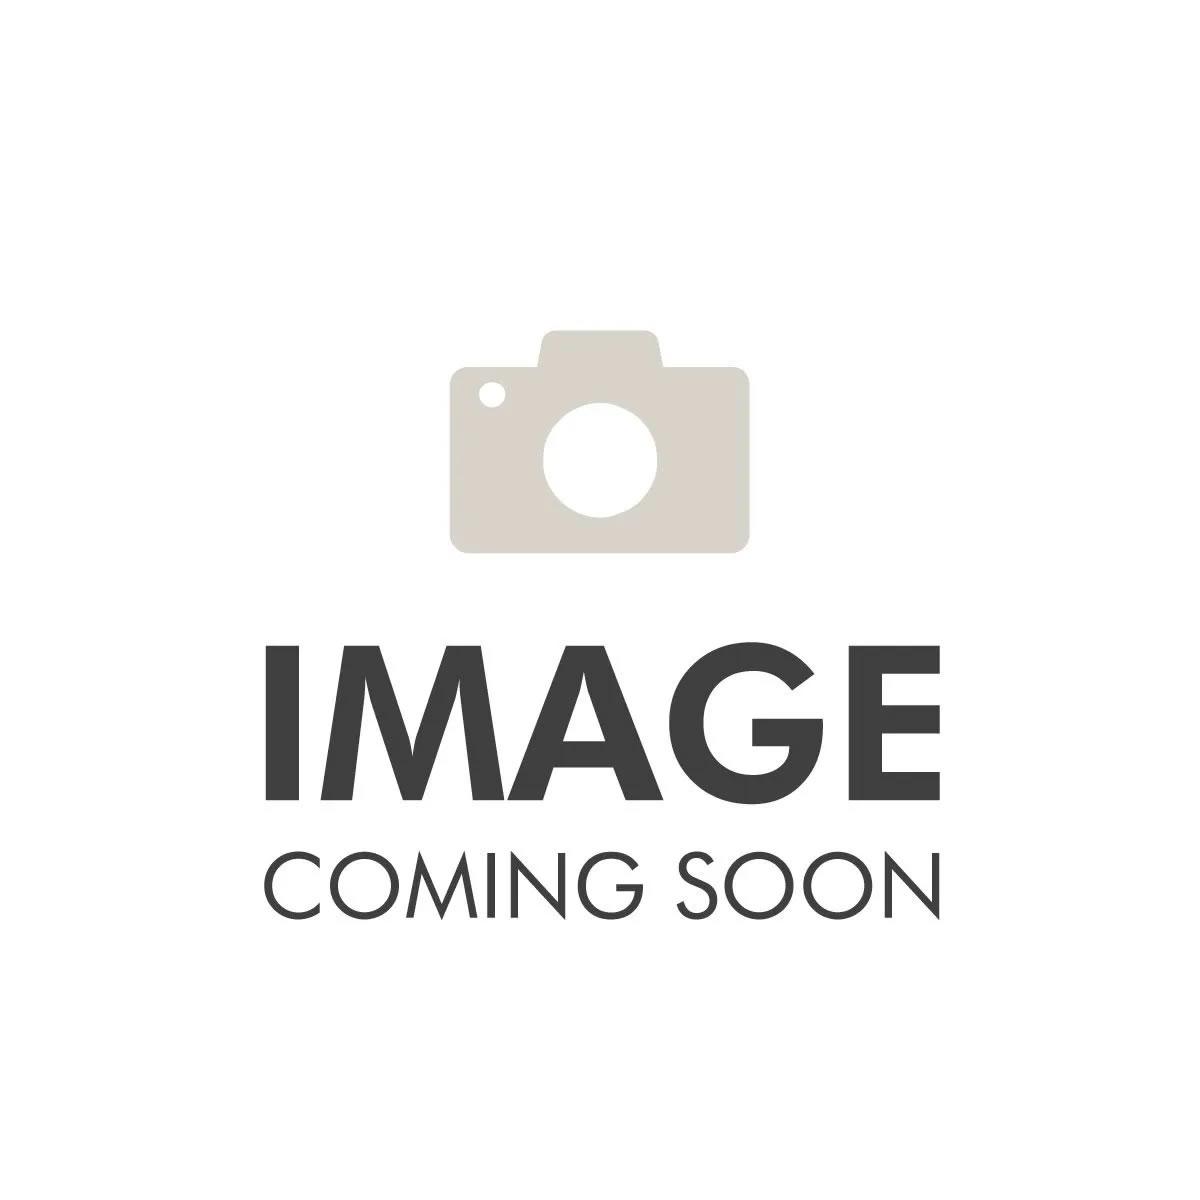 A-Pillar 4 Switch Pod Blk RHD 11-18 Wrangler JK